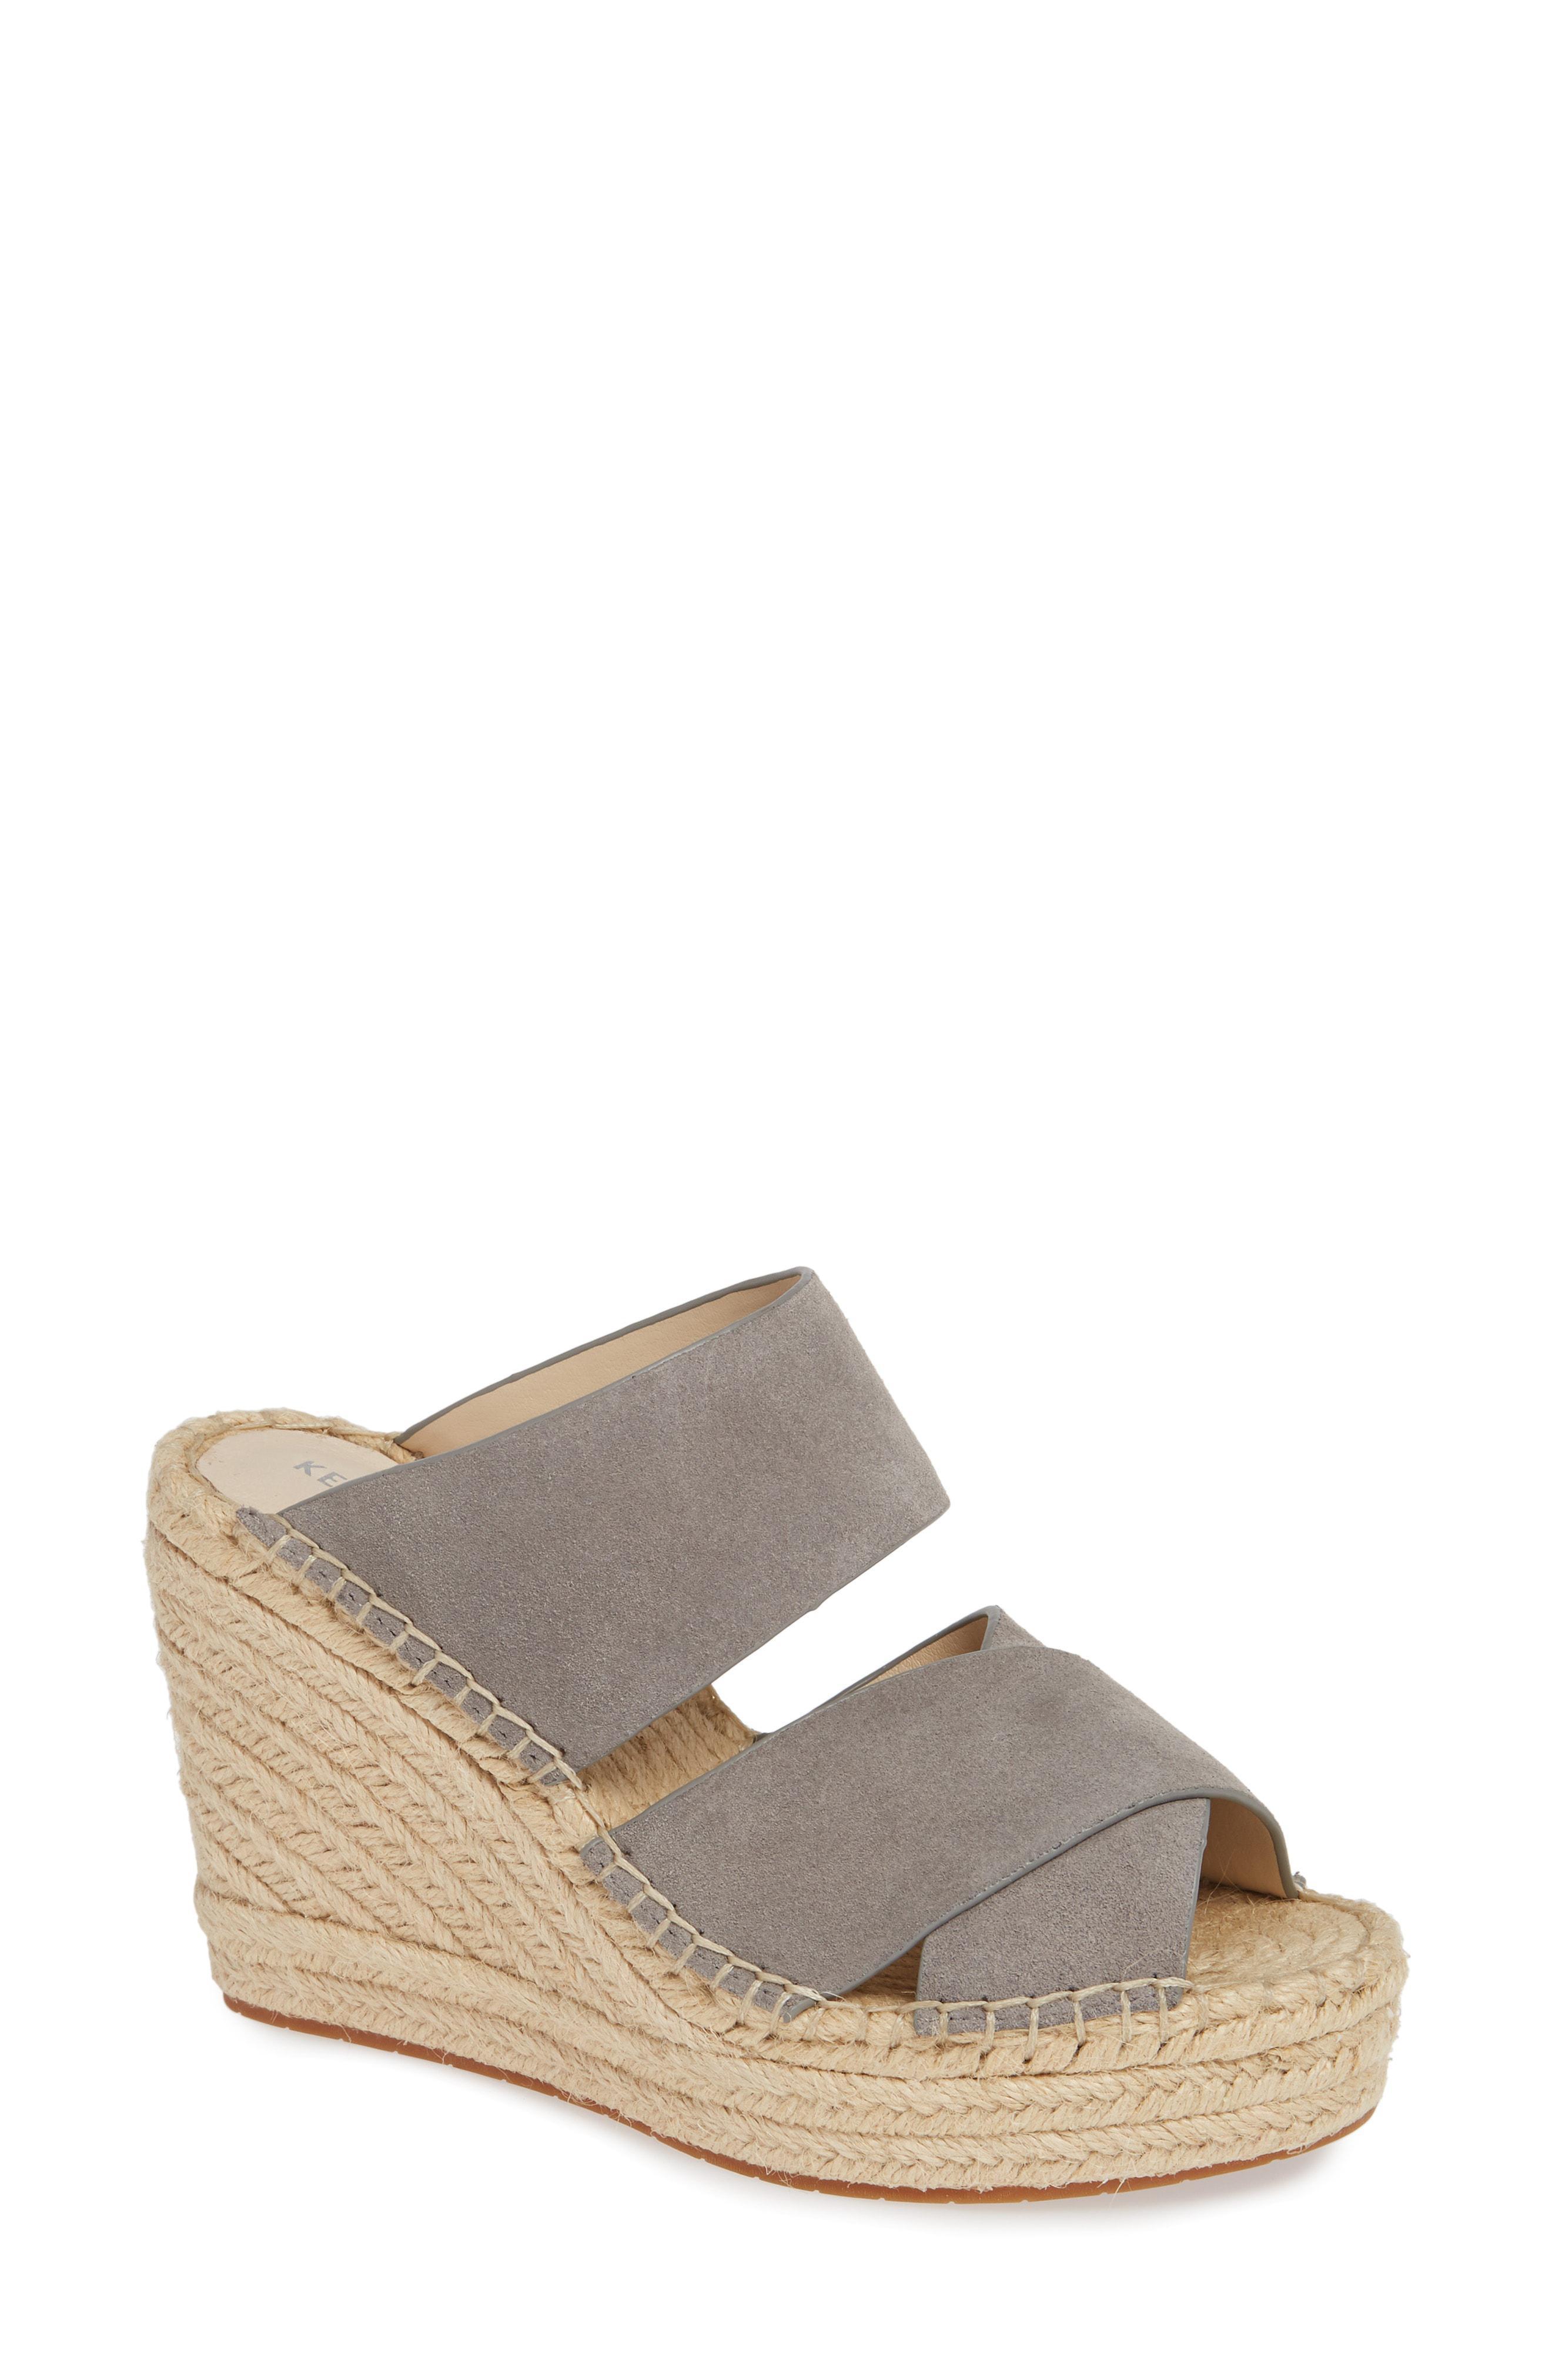 8a5d1caadb2b Lyst - Kenneth Cole Olivia Wedge Slide Sandal in Gray